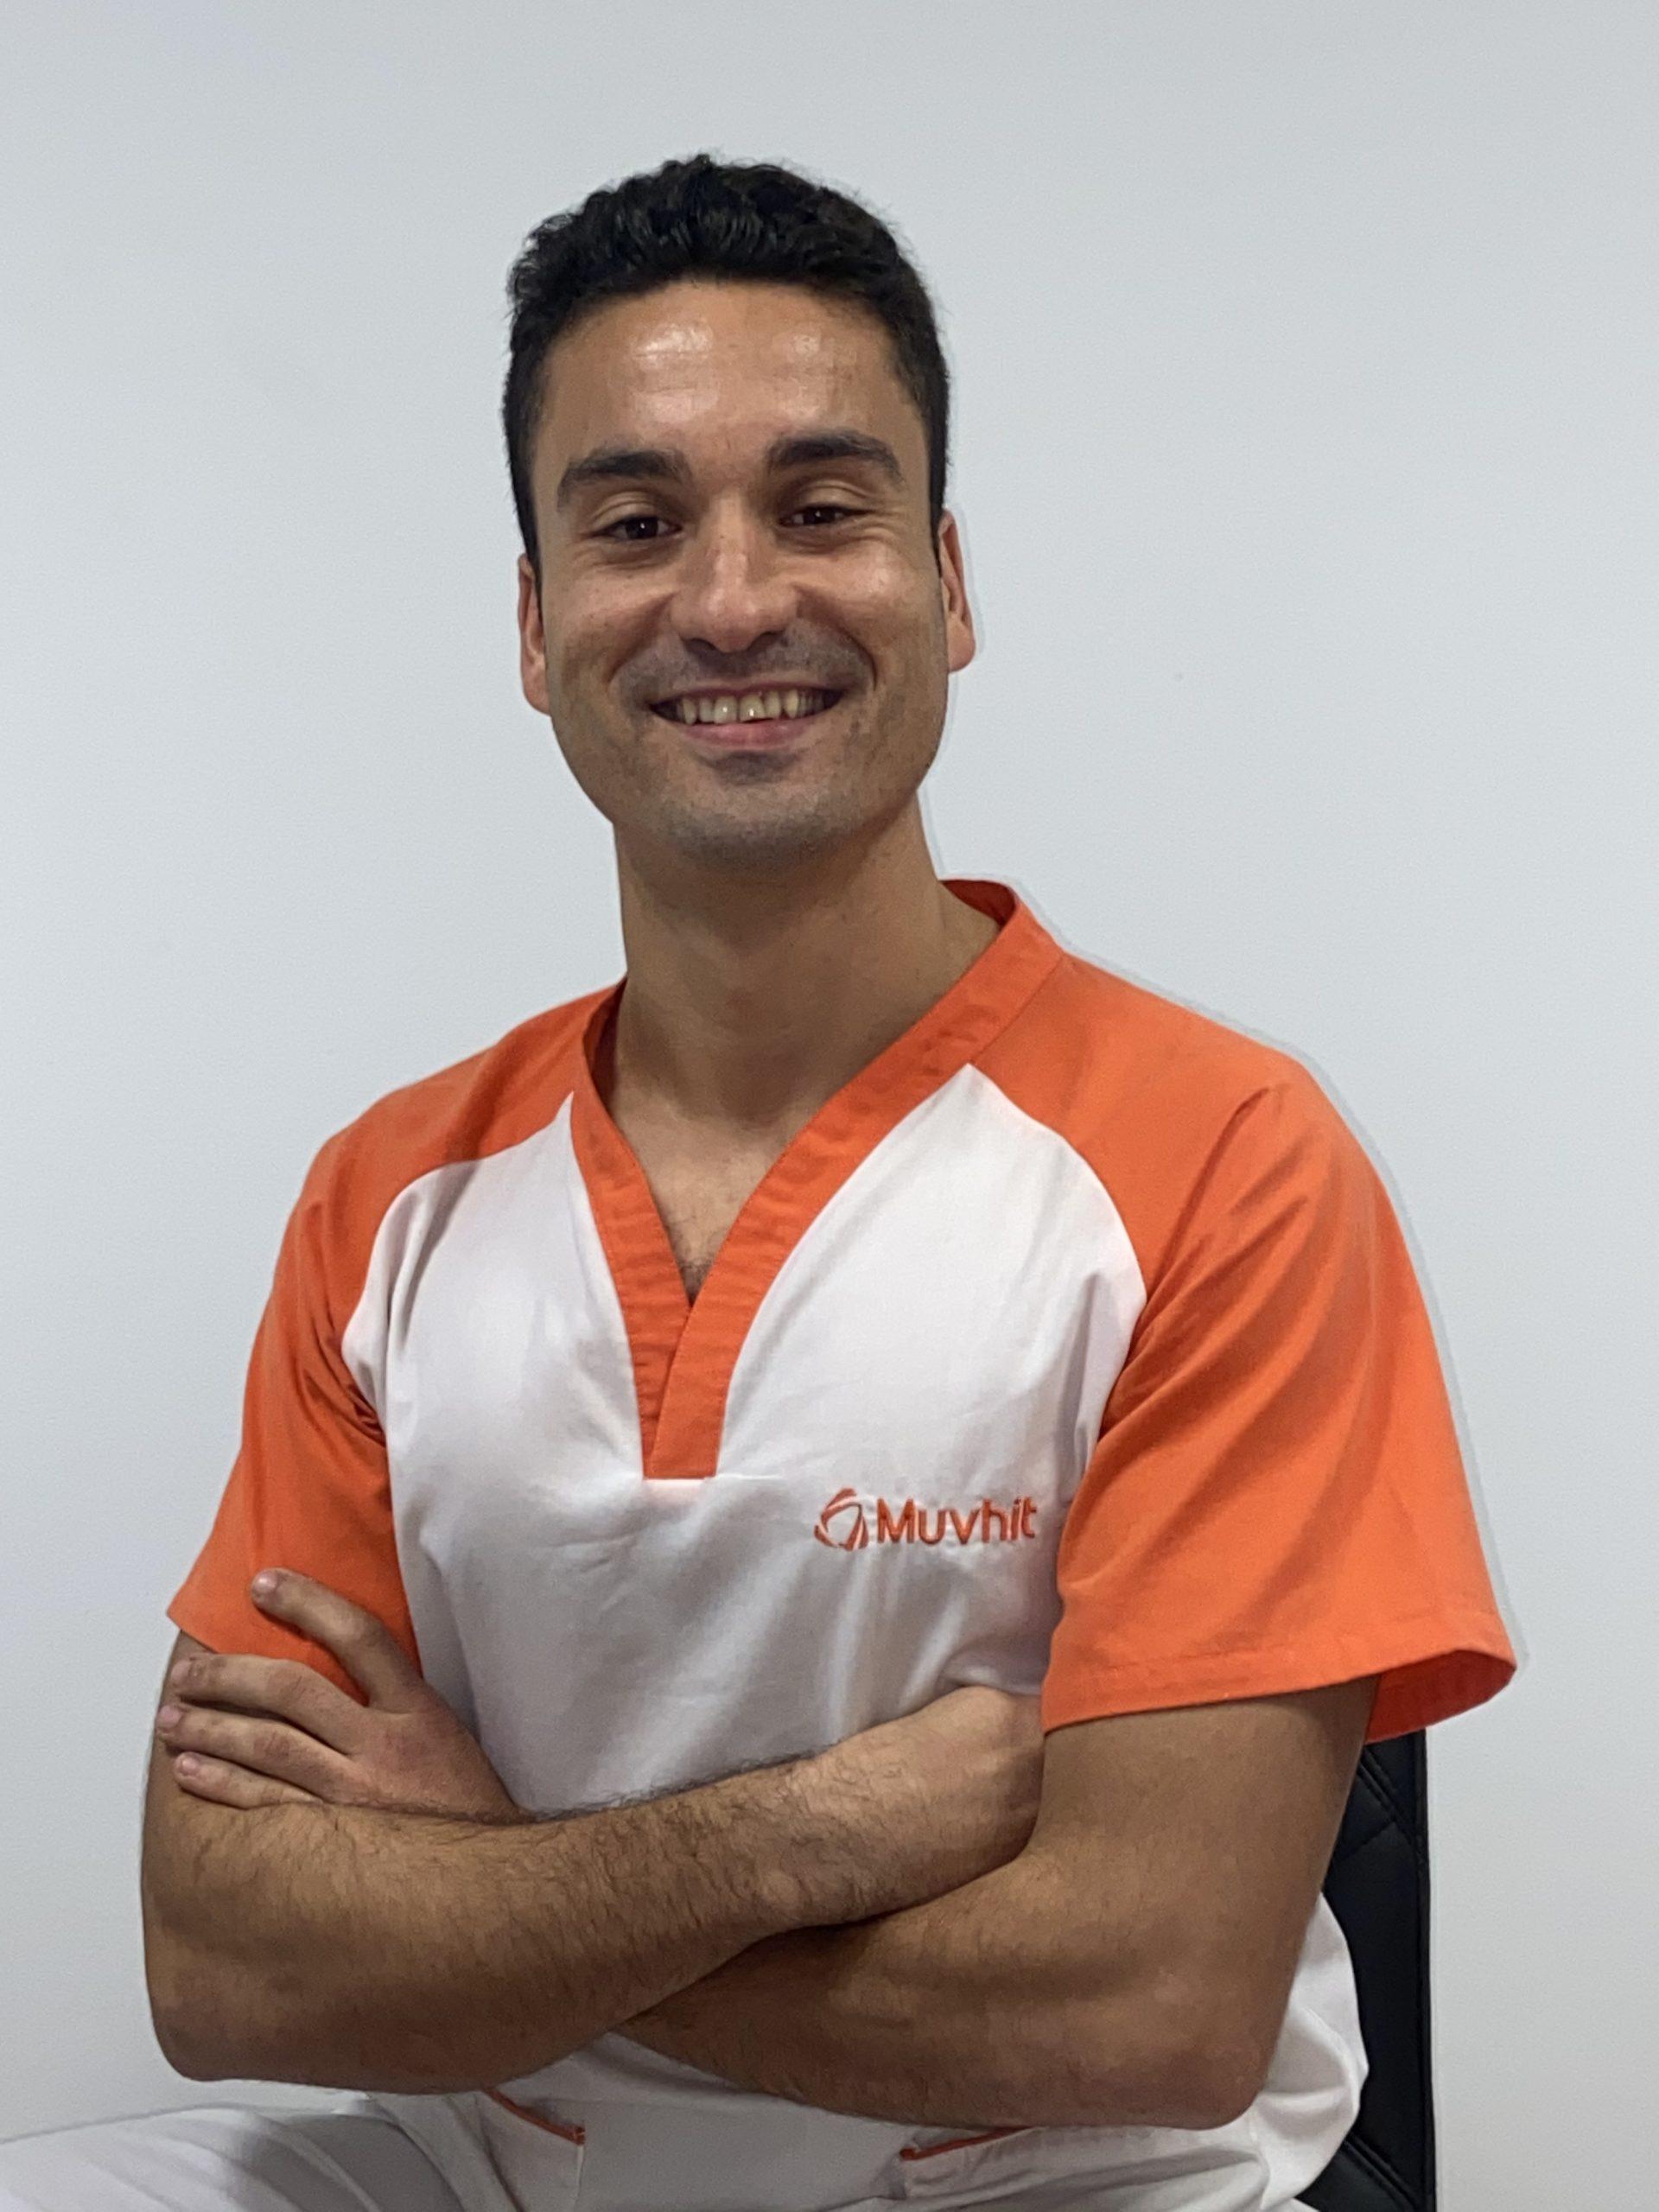 Daniel Aguilar Robles